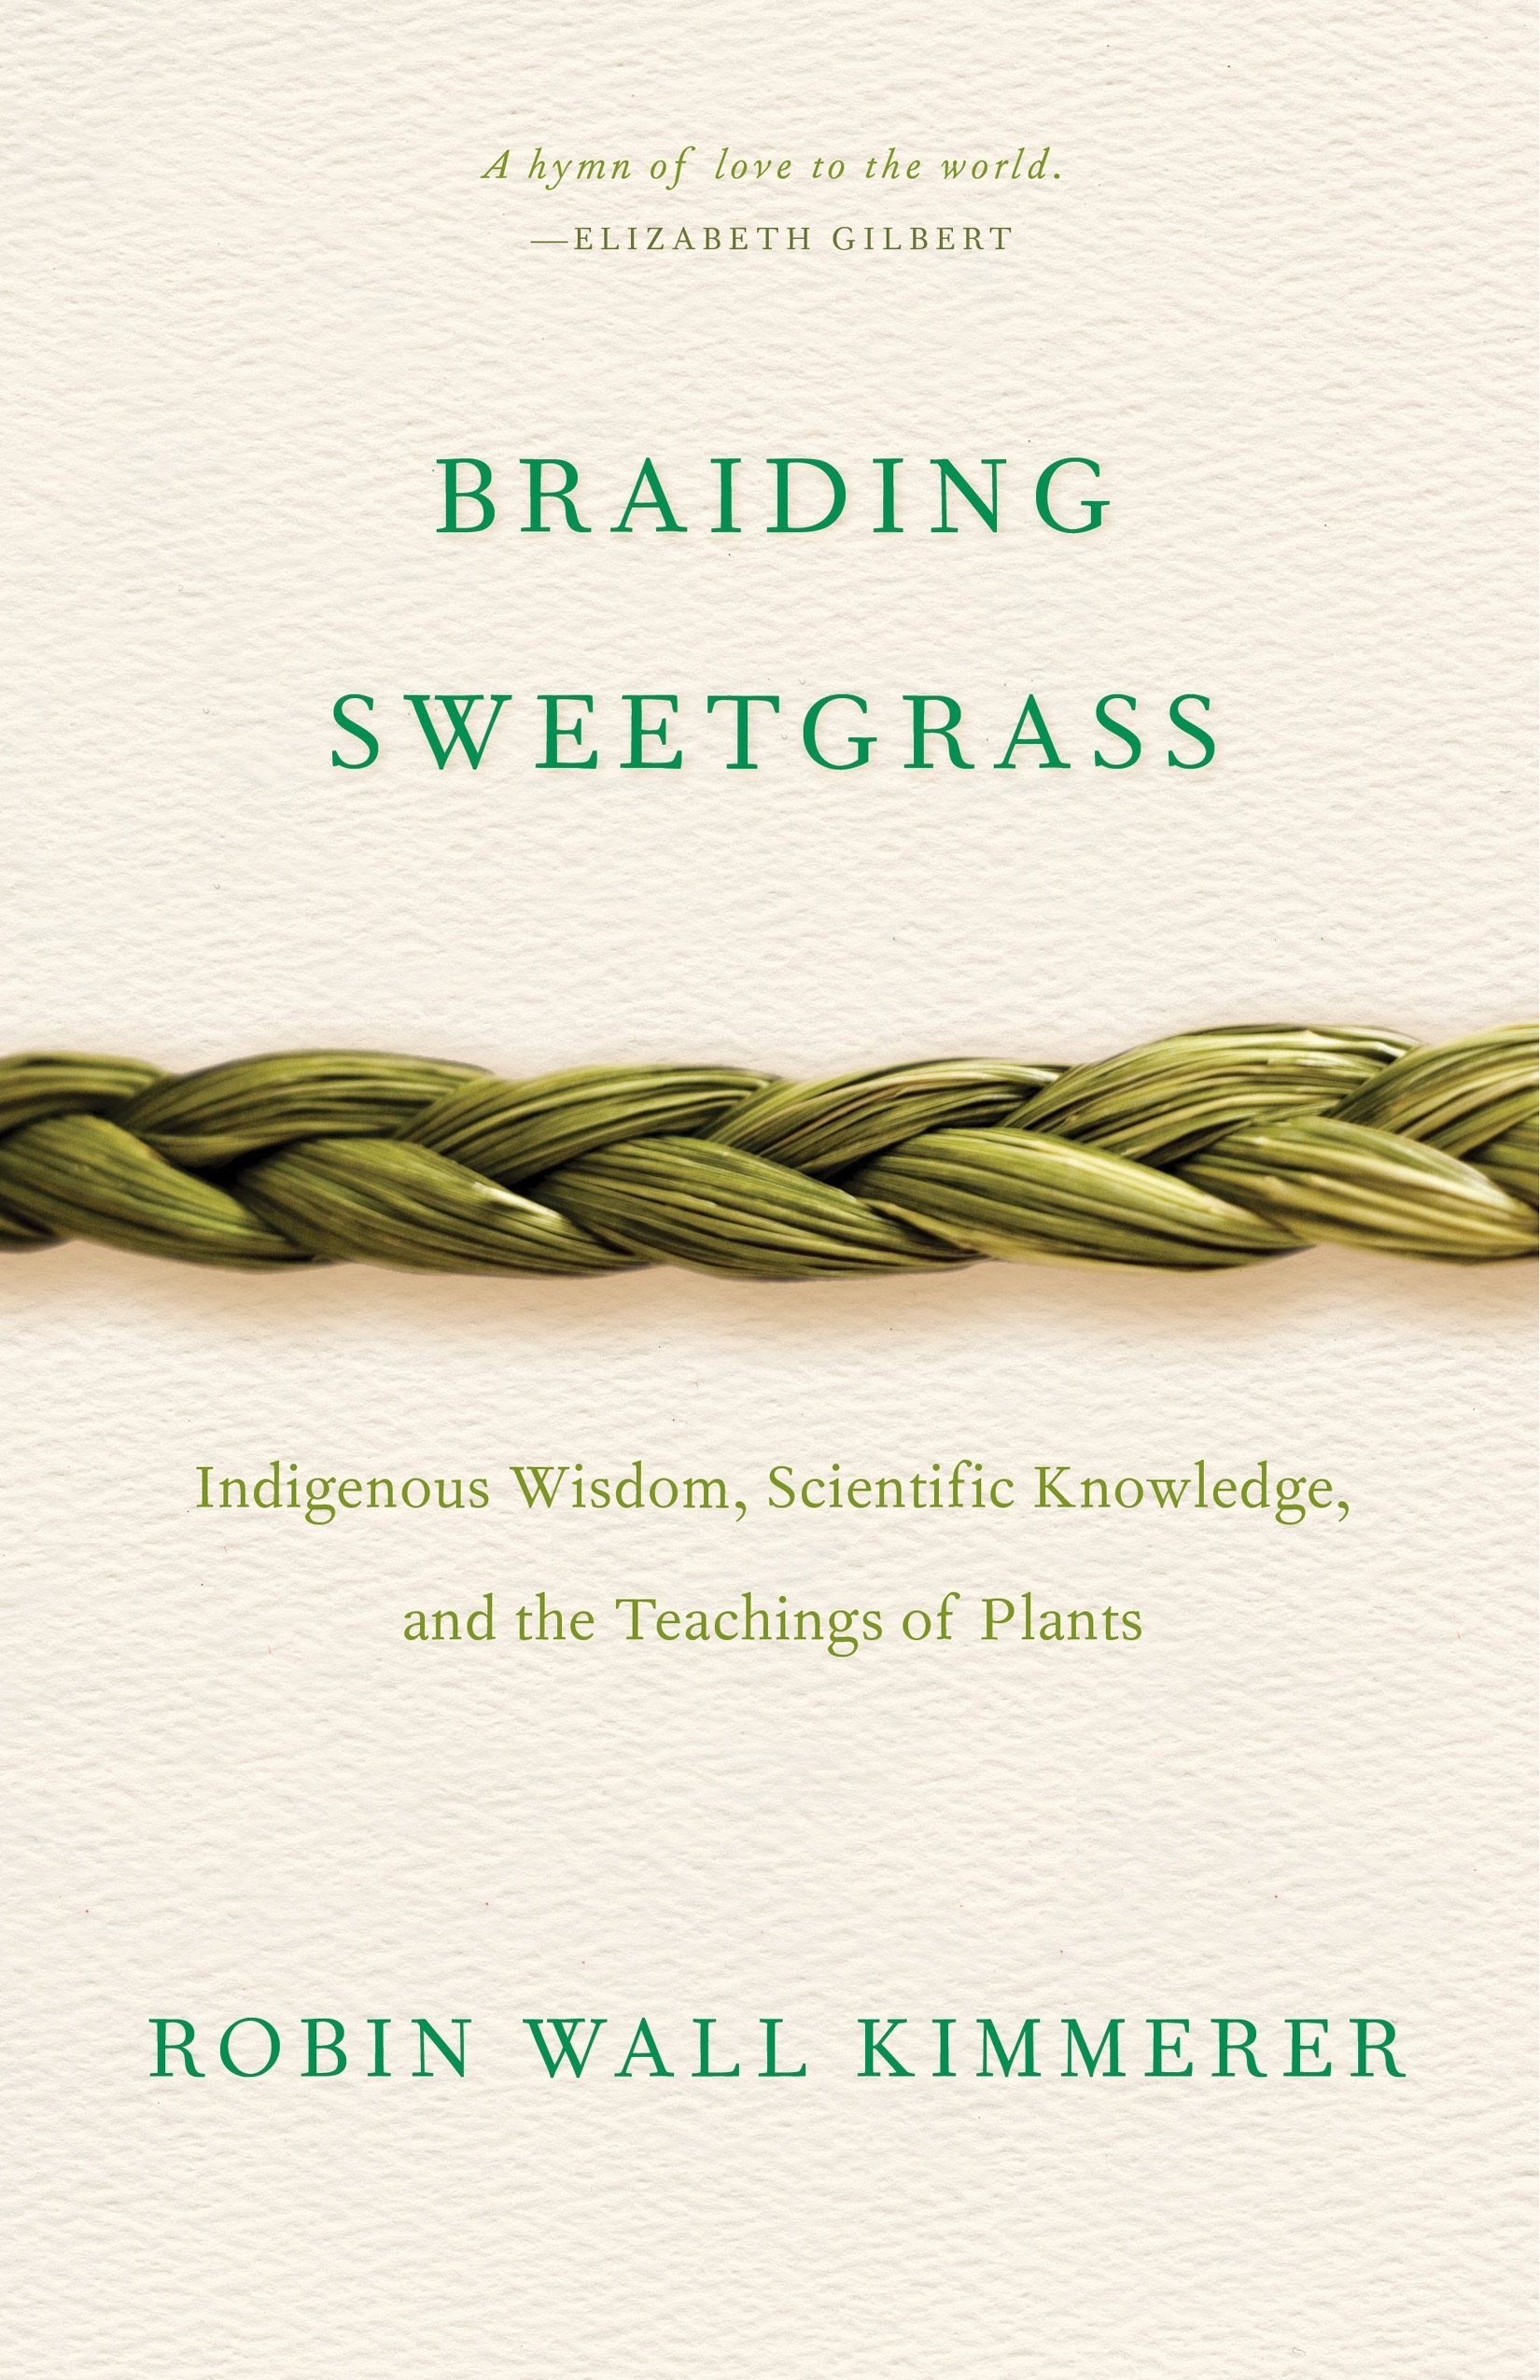 Braiding Sweetgras